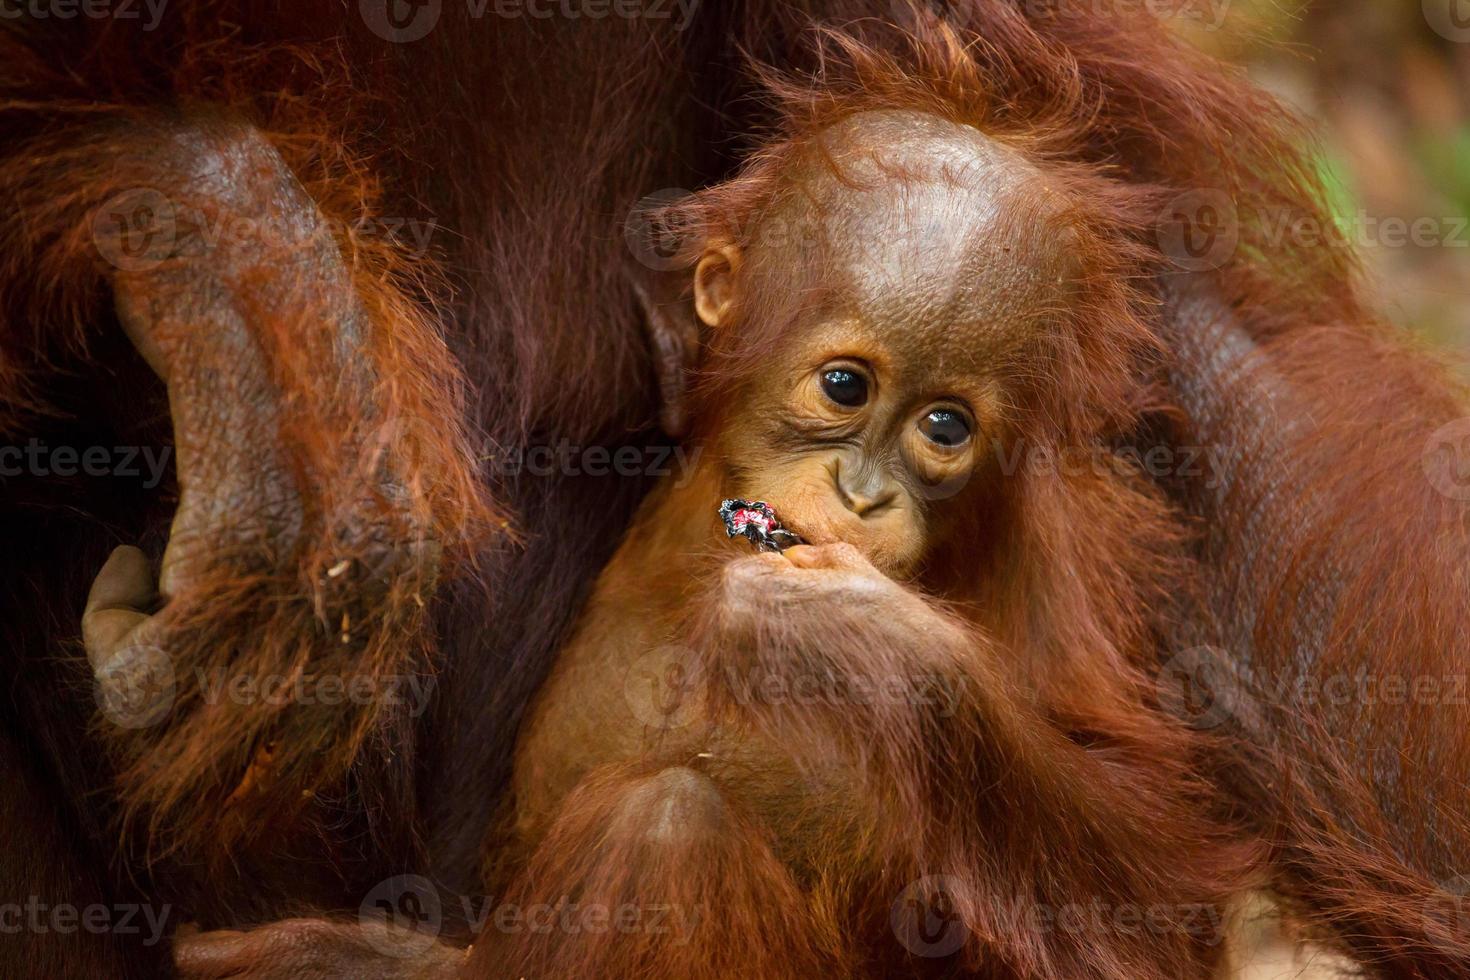 adorable bebé orangután. foto